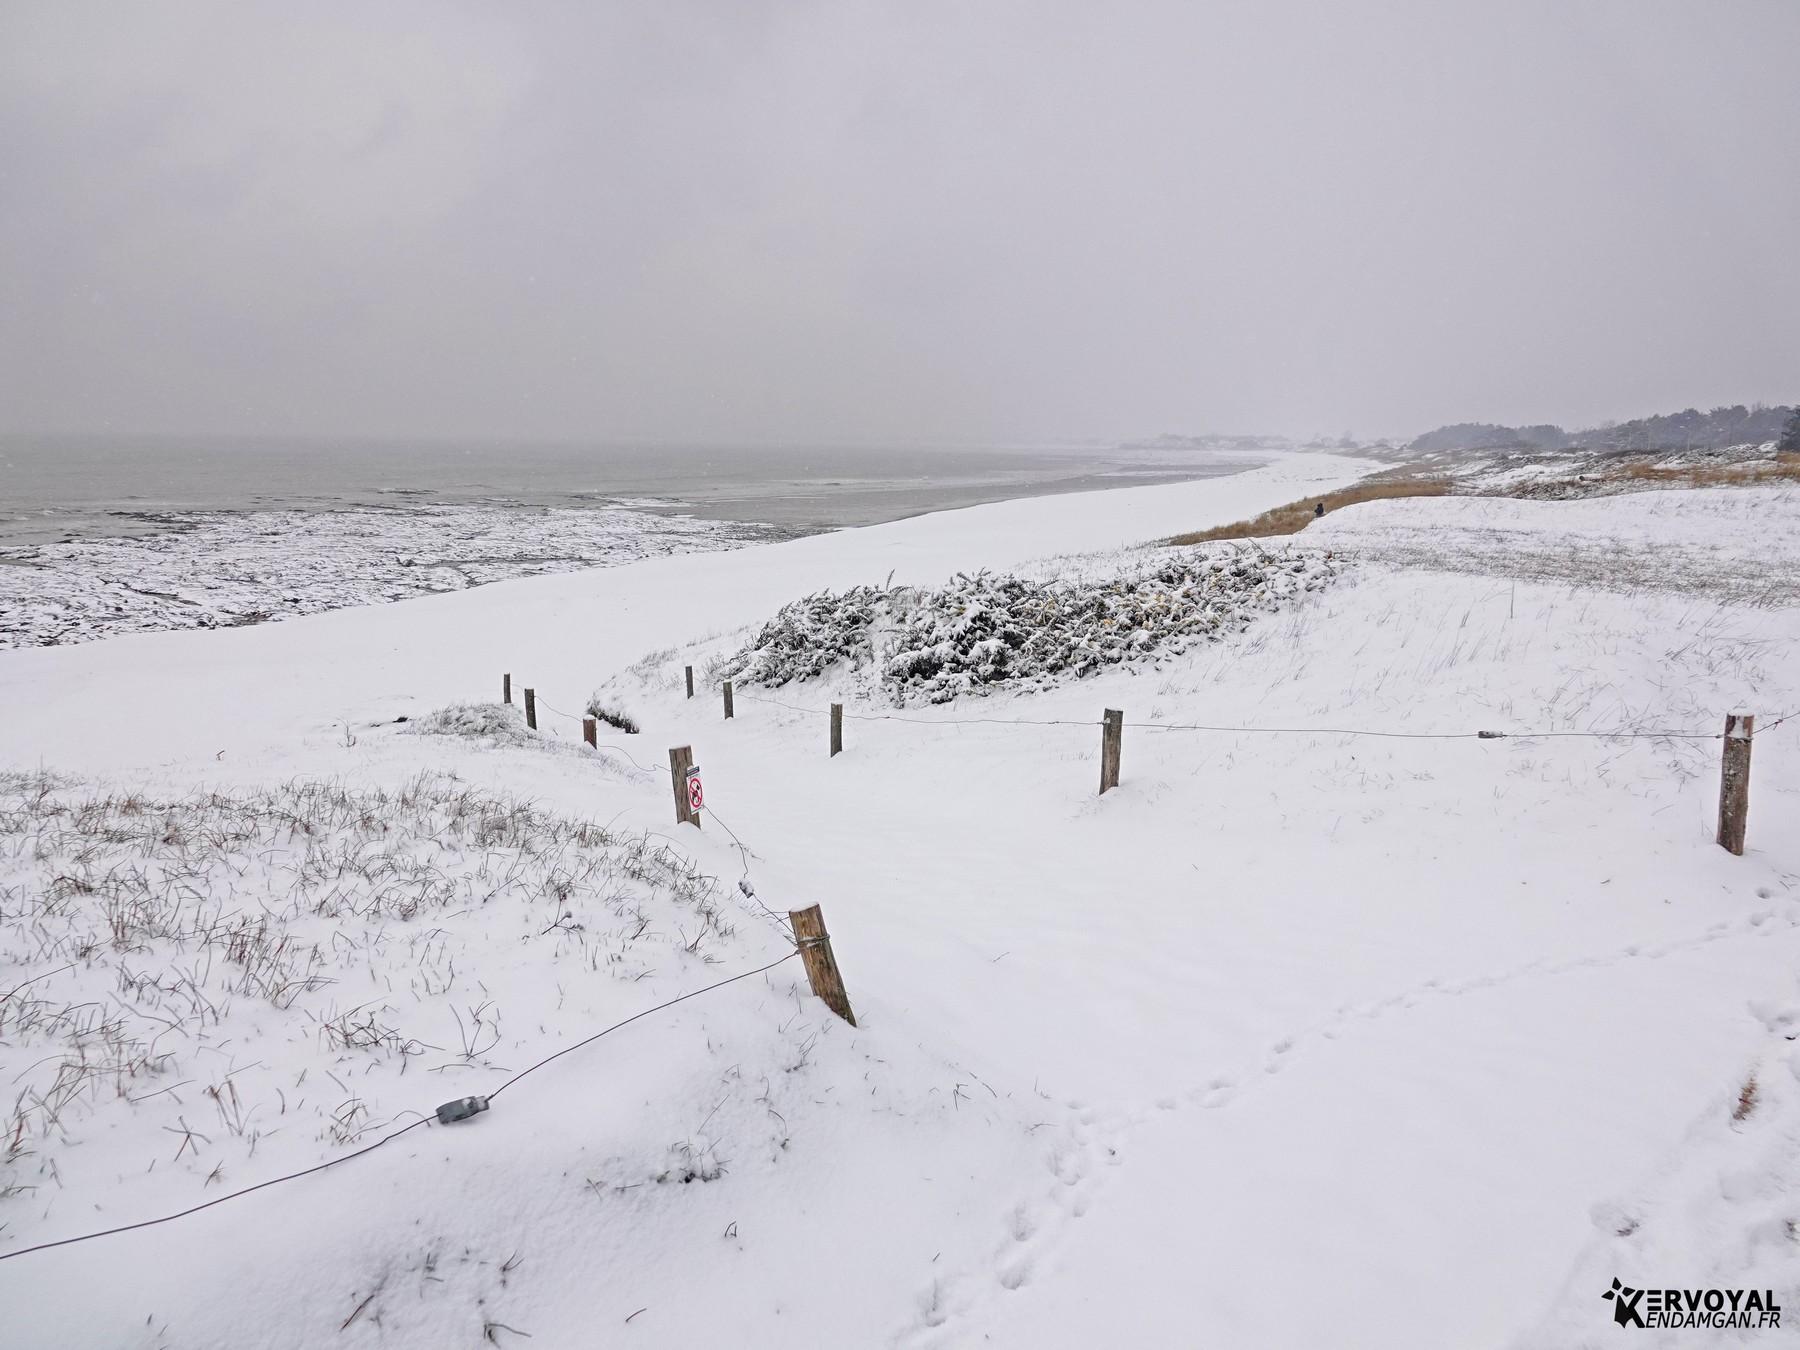 neige à kervoyal 11 février 2021 damgan morbihan (9)